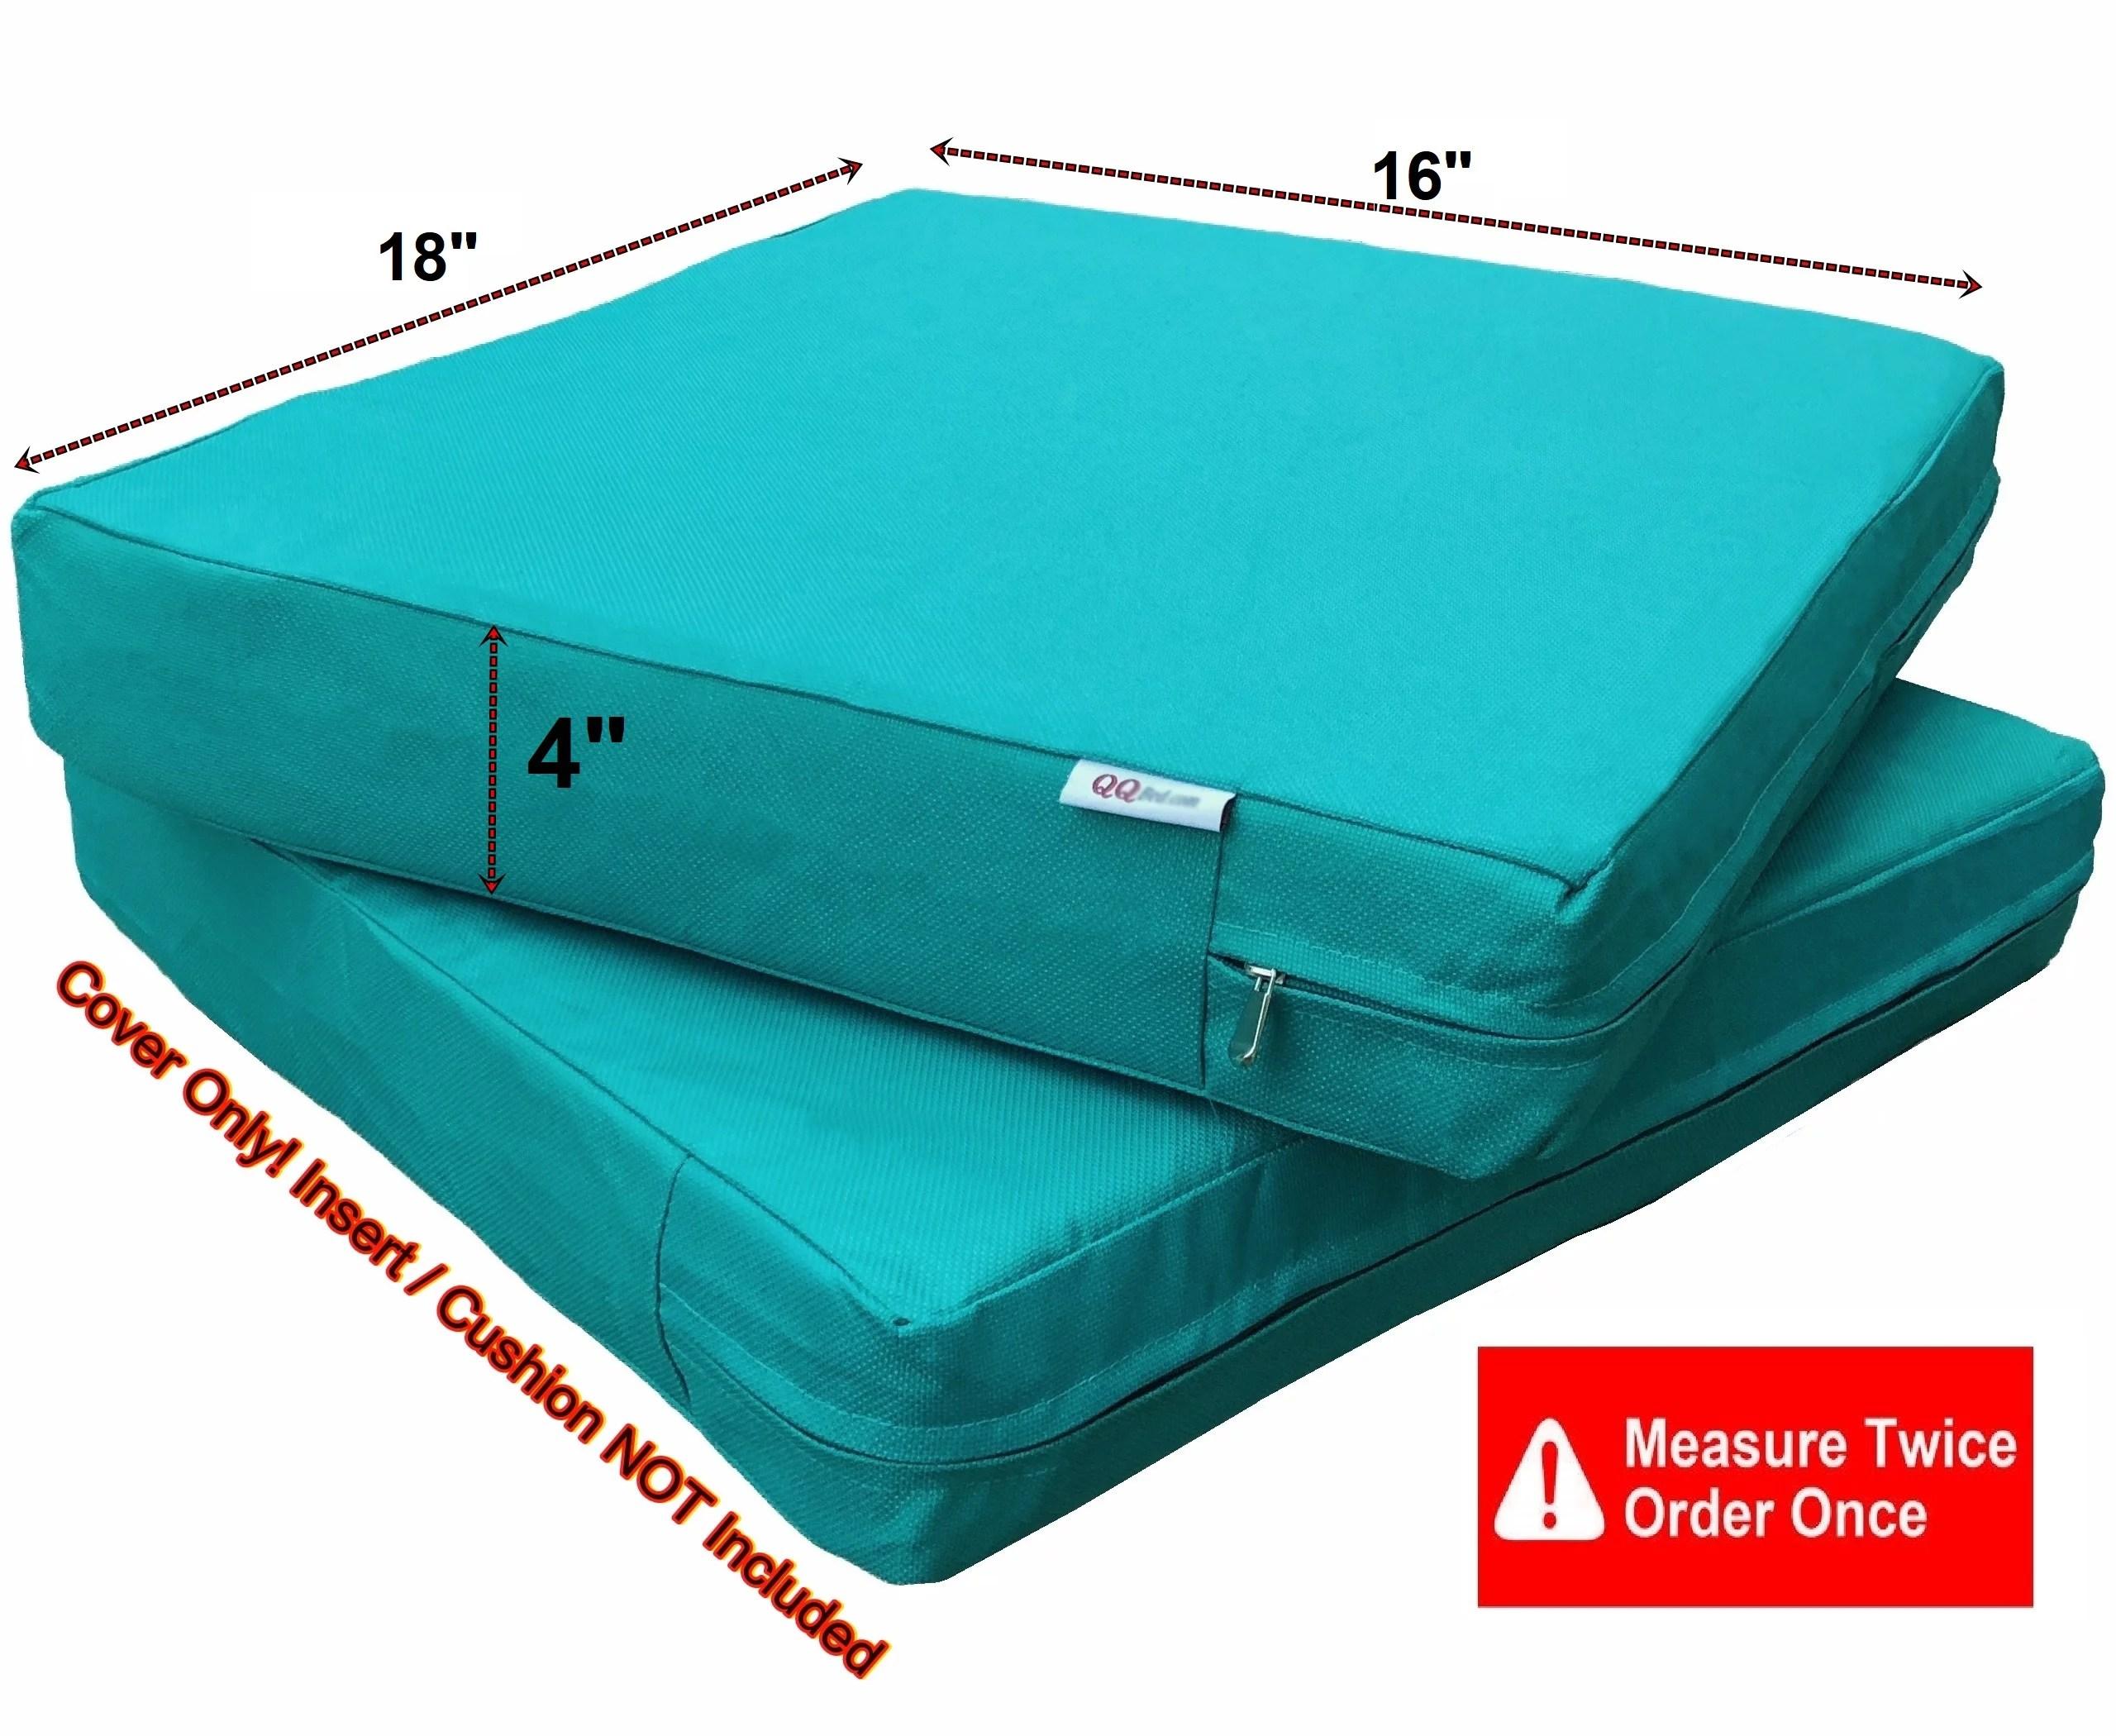 waterproof outdoor 4 pack deep seat chair patio cushions zipper cover 18 x16 x4 duvet replacement case